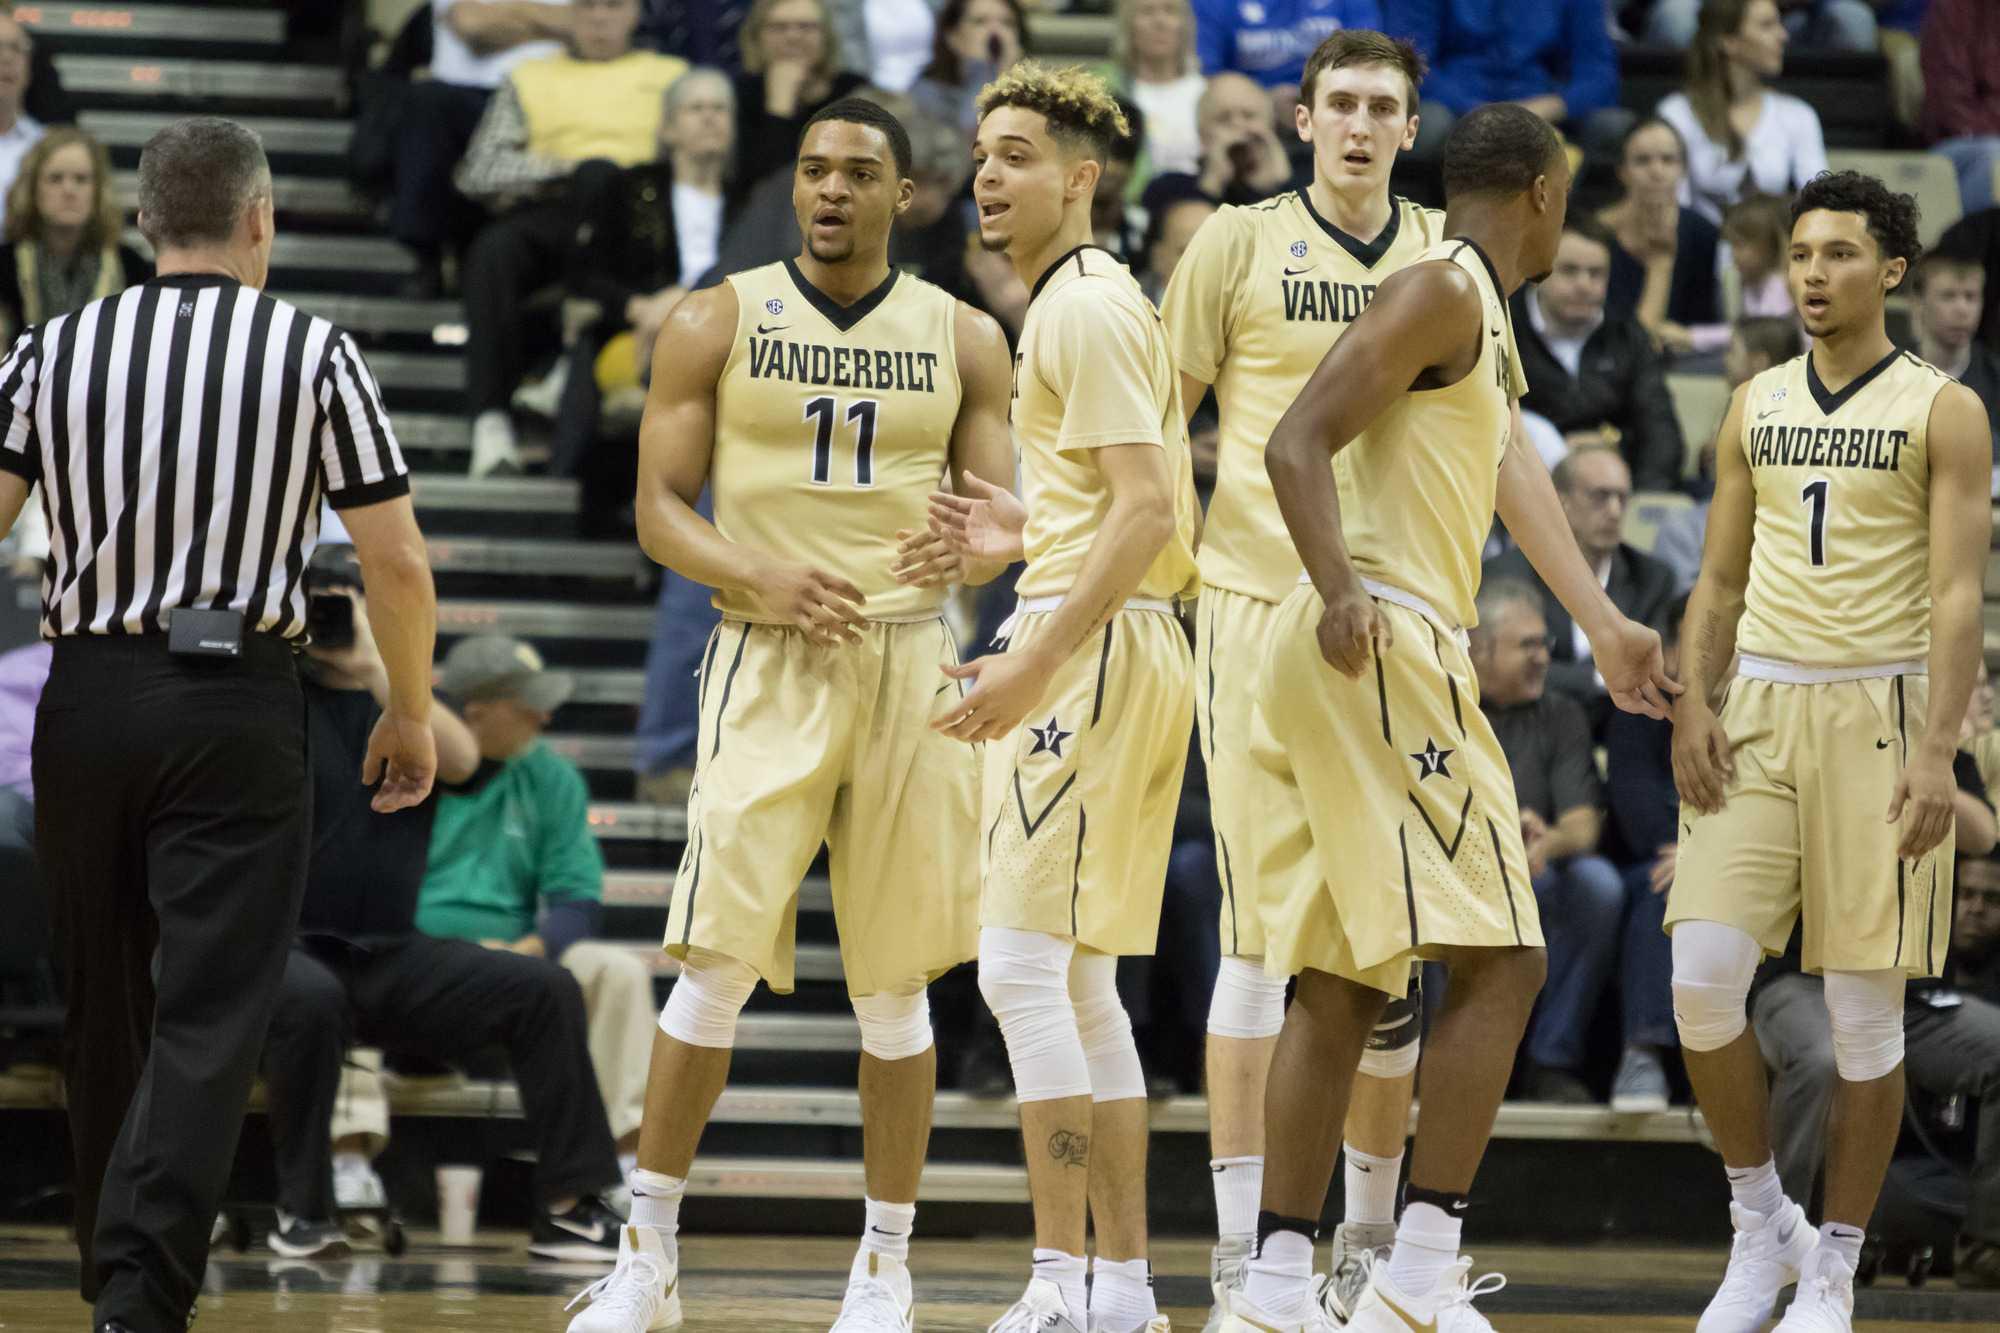 Matthew Fisher-Davis (5) argues a call as Vanderbilt lost to #6 Kentucky 87-81 at Memorial Gym January 10, 2016.